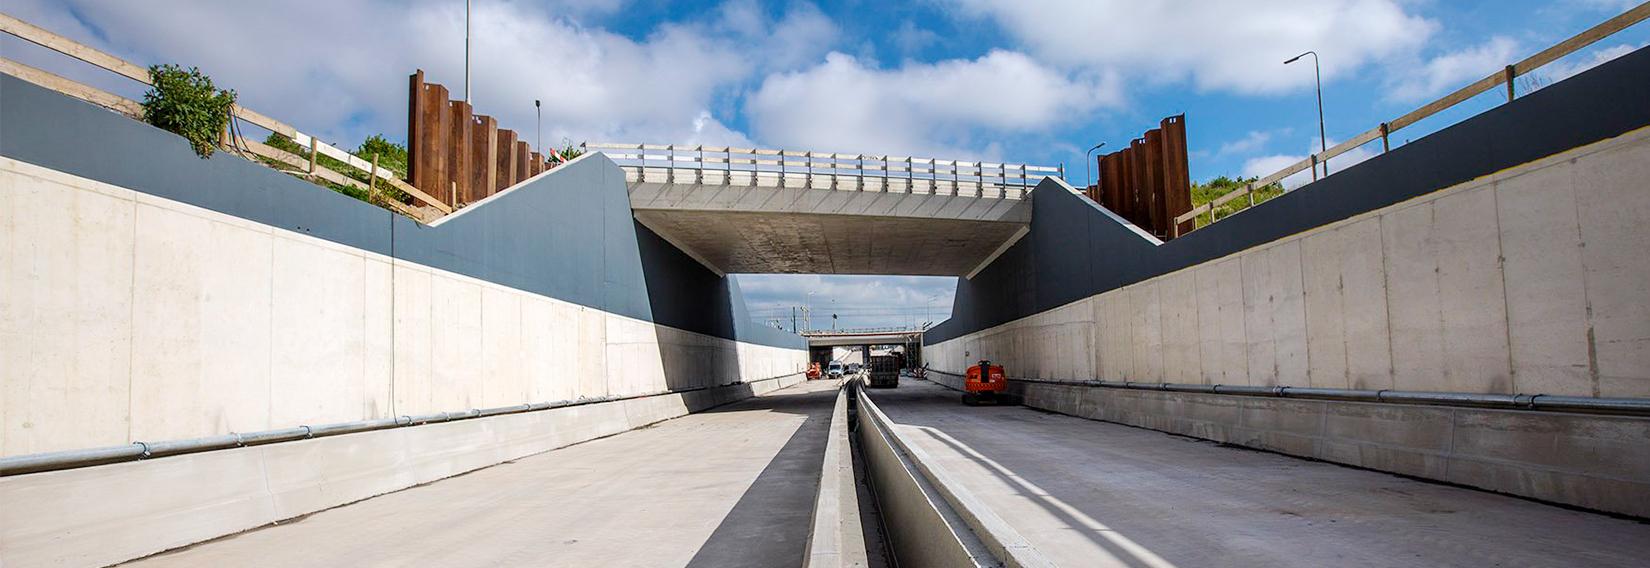 beton coating op kleur tunnel